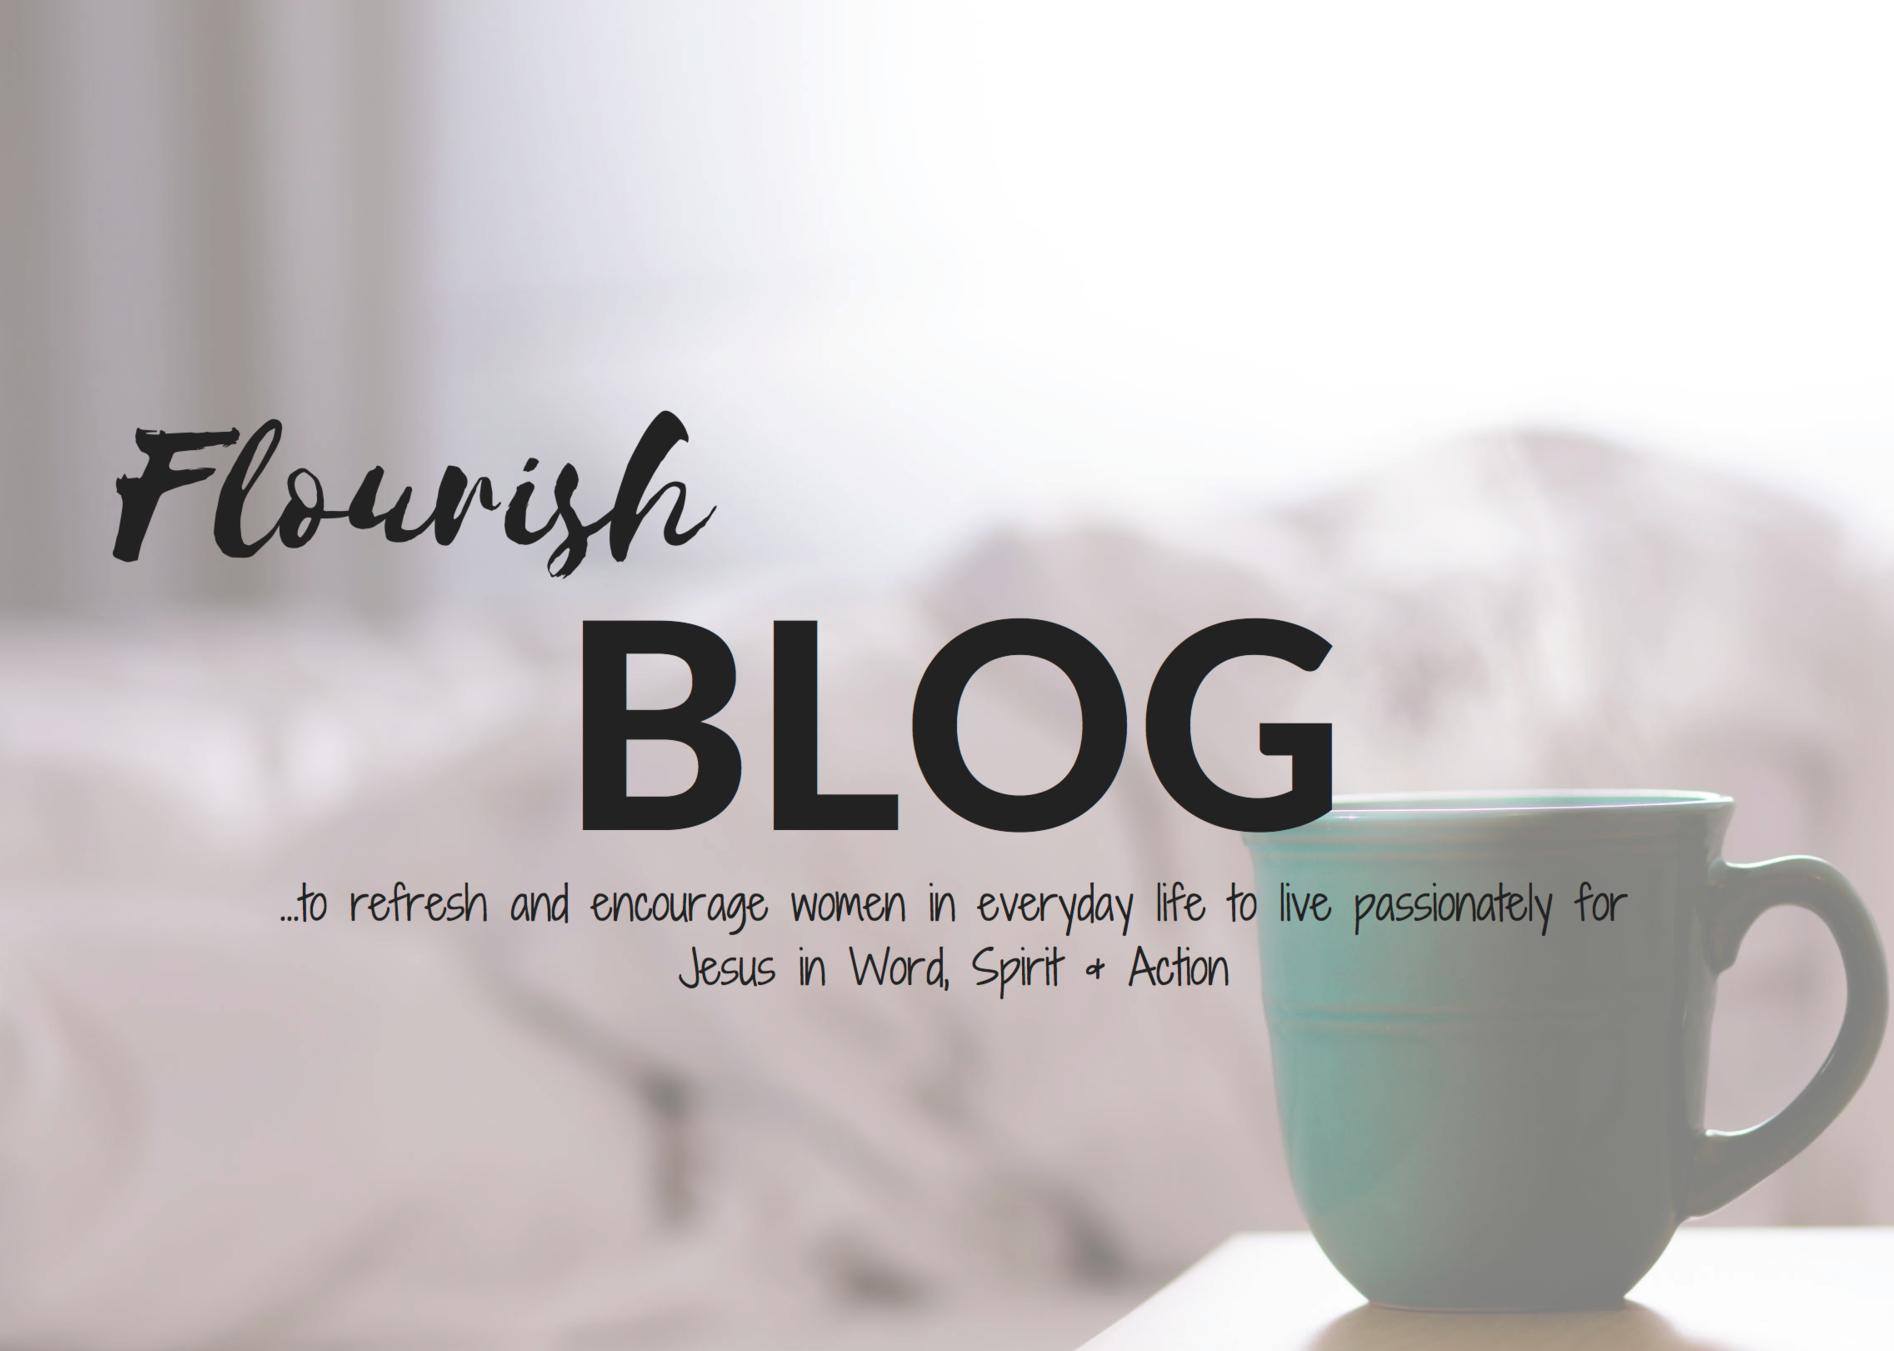 Flourish Blog Cover.png